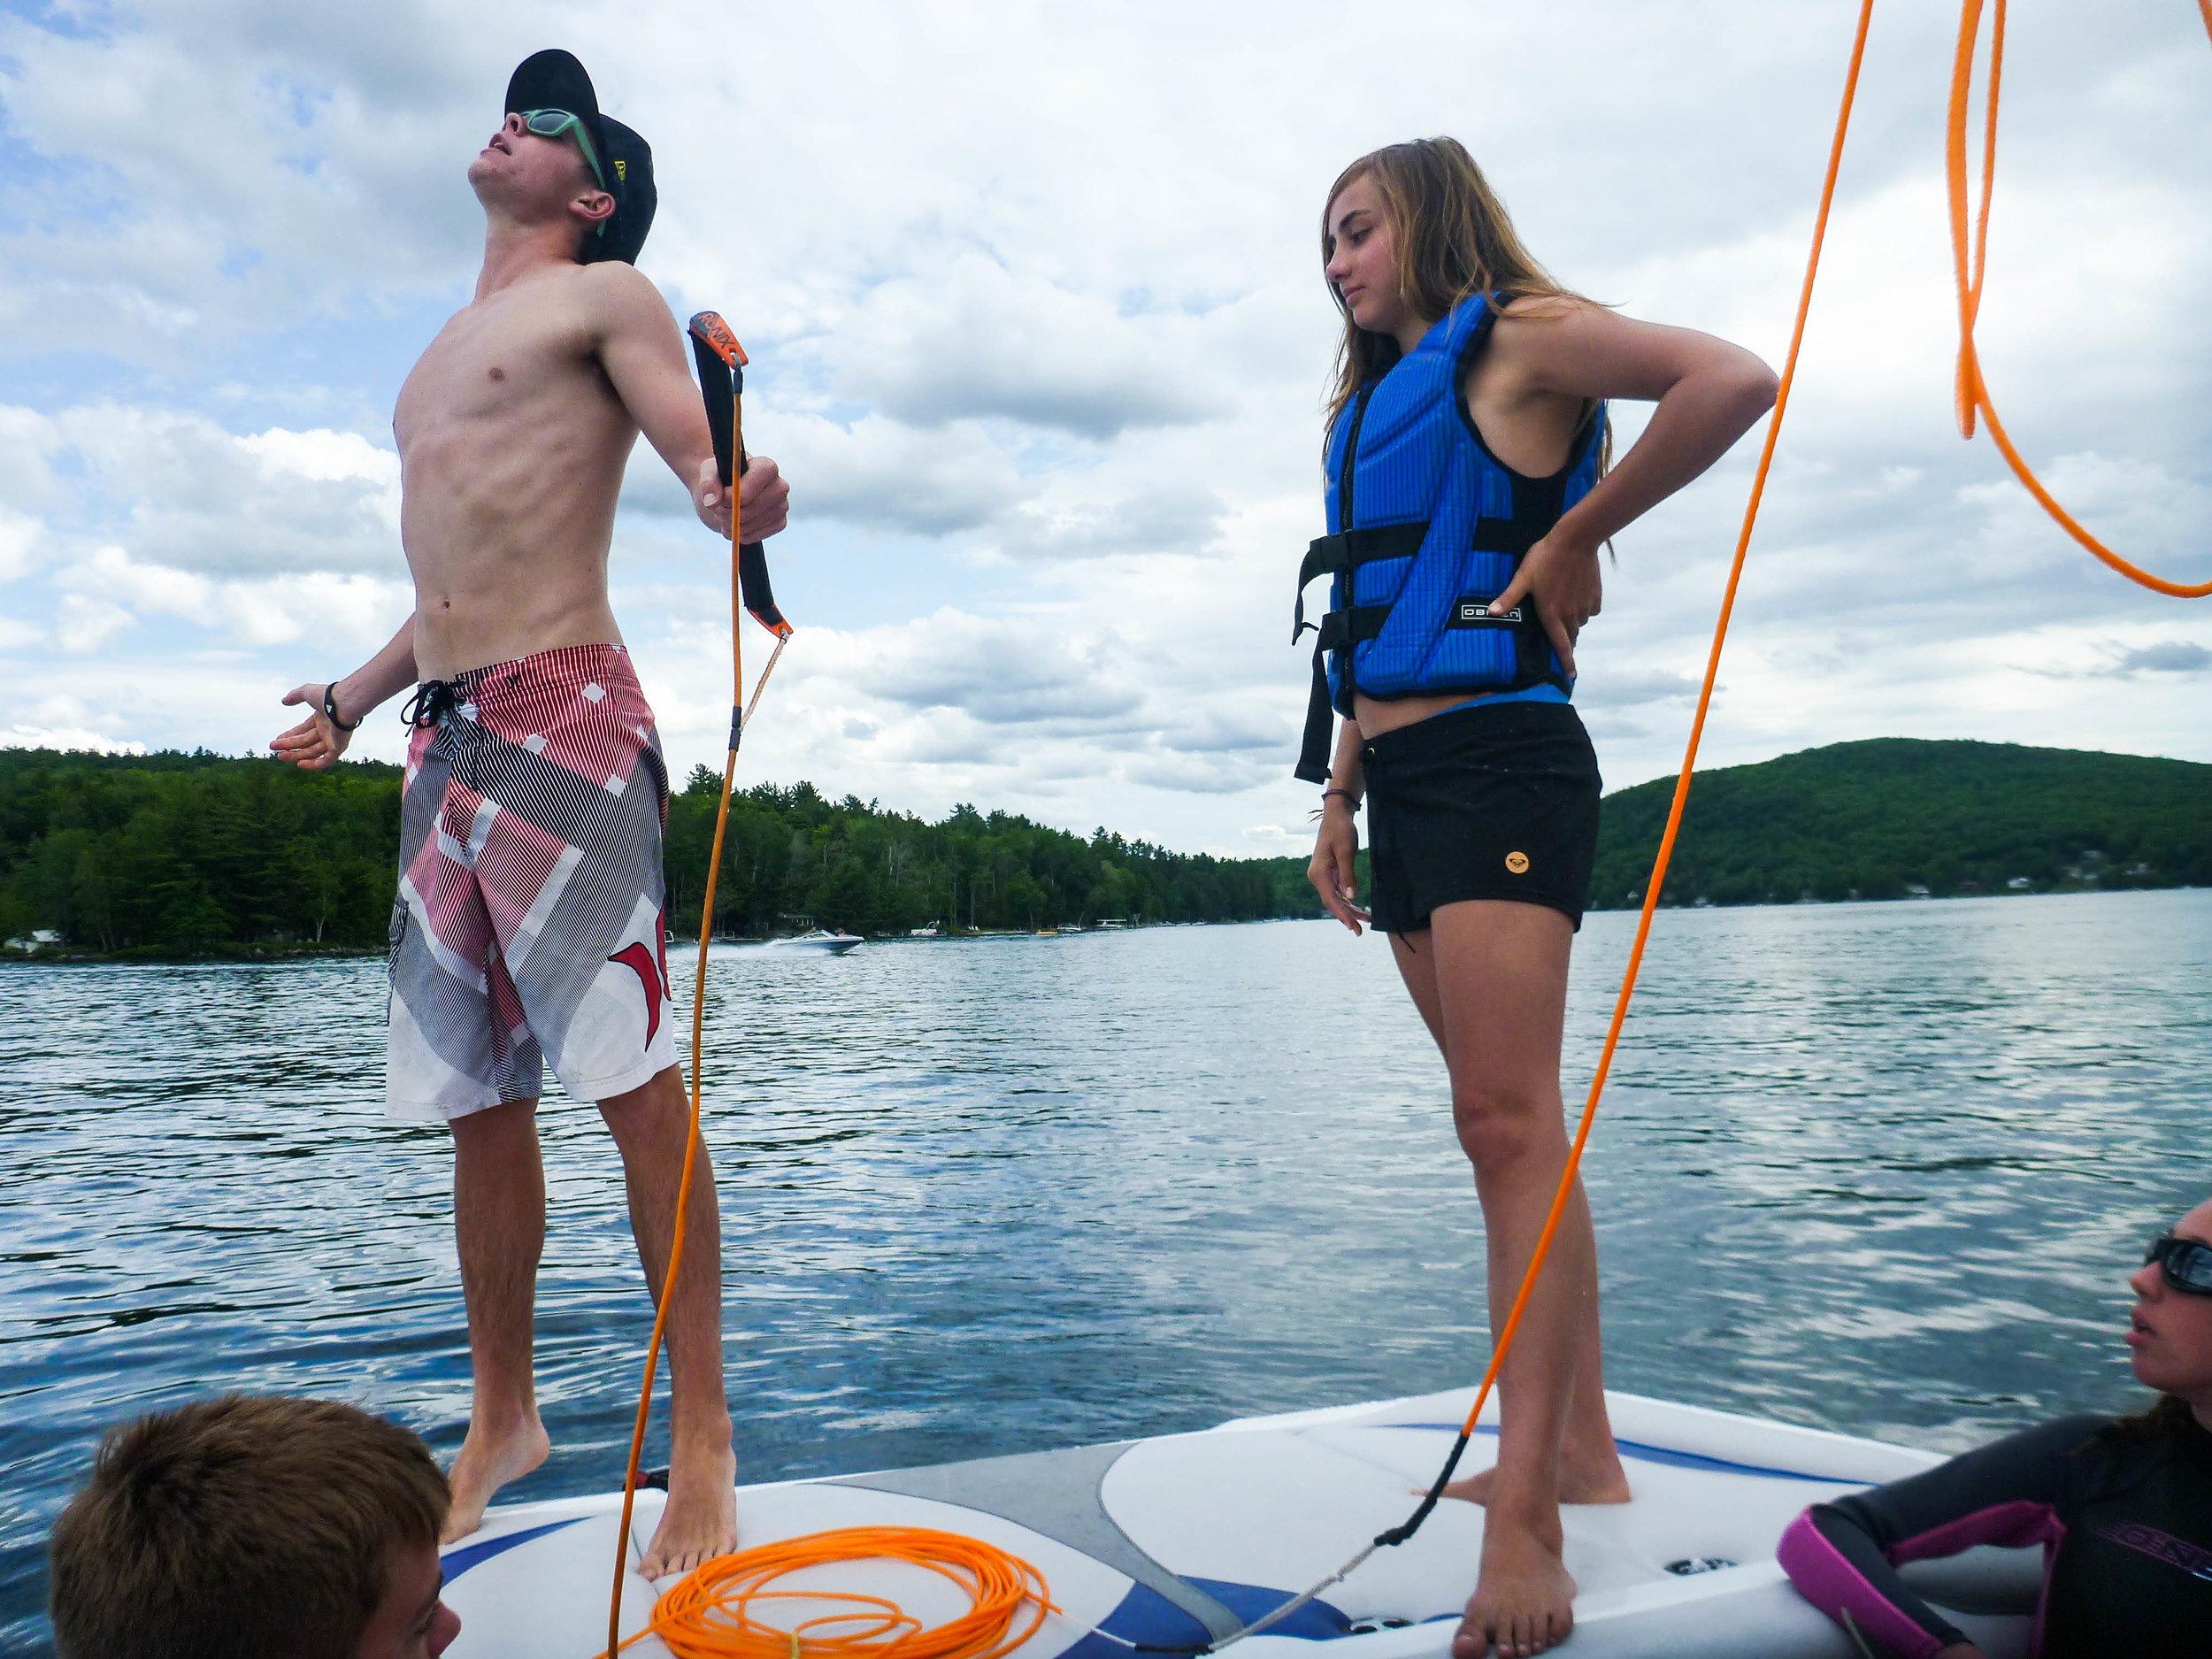 Summer camp lake instruction wakeboard